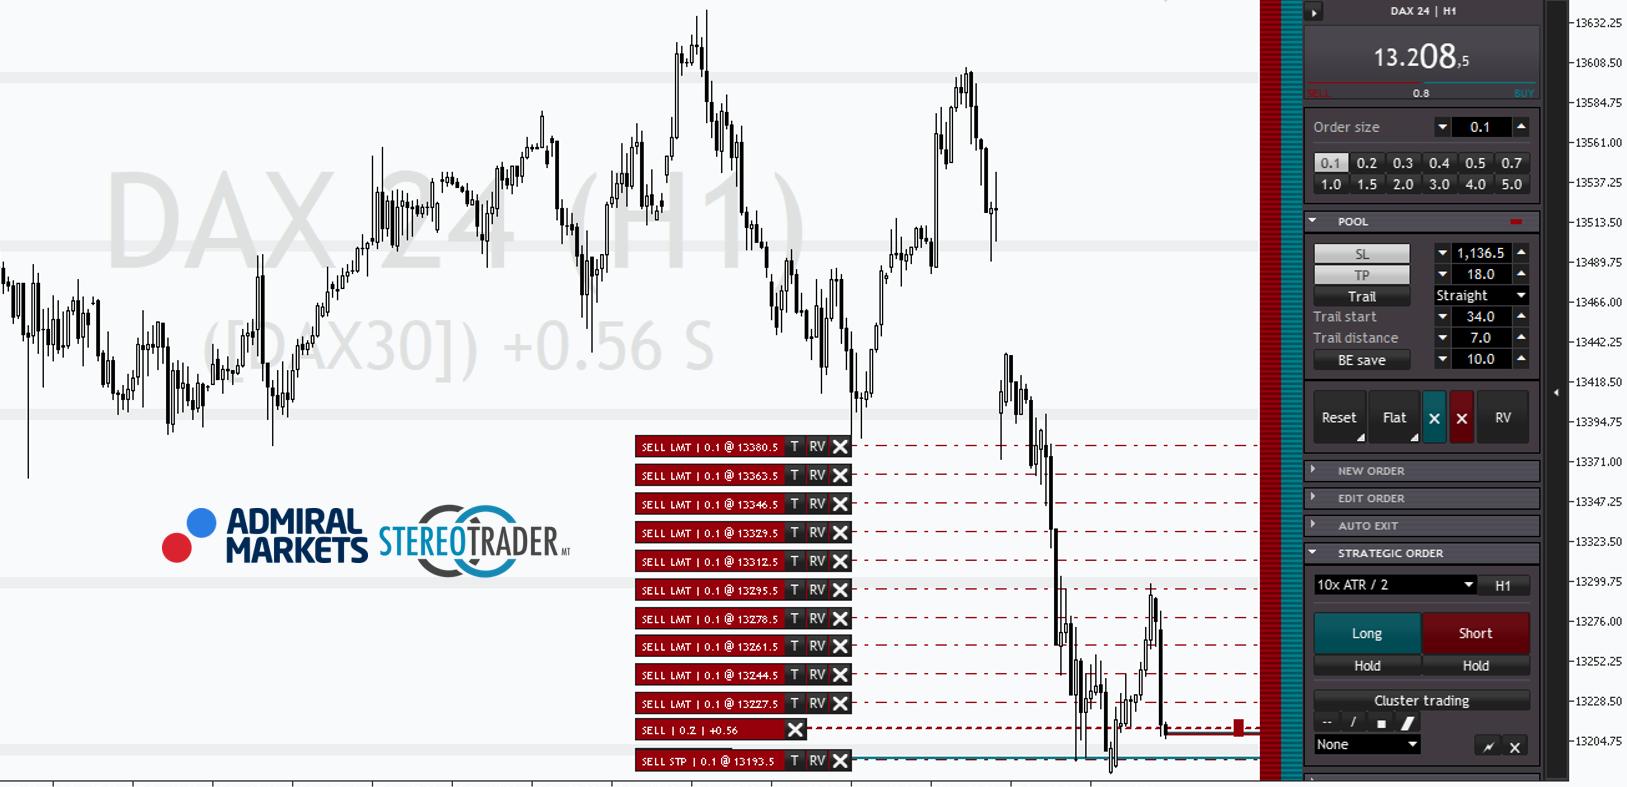 Dow-Jones-Analyse-Trendlos-Kommentar-Jens-Chrzanowski-GodmodeTrader.de-3